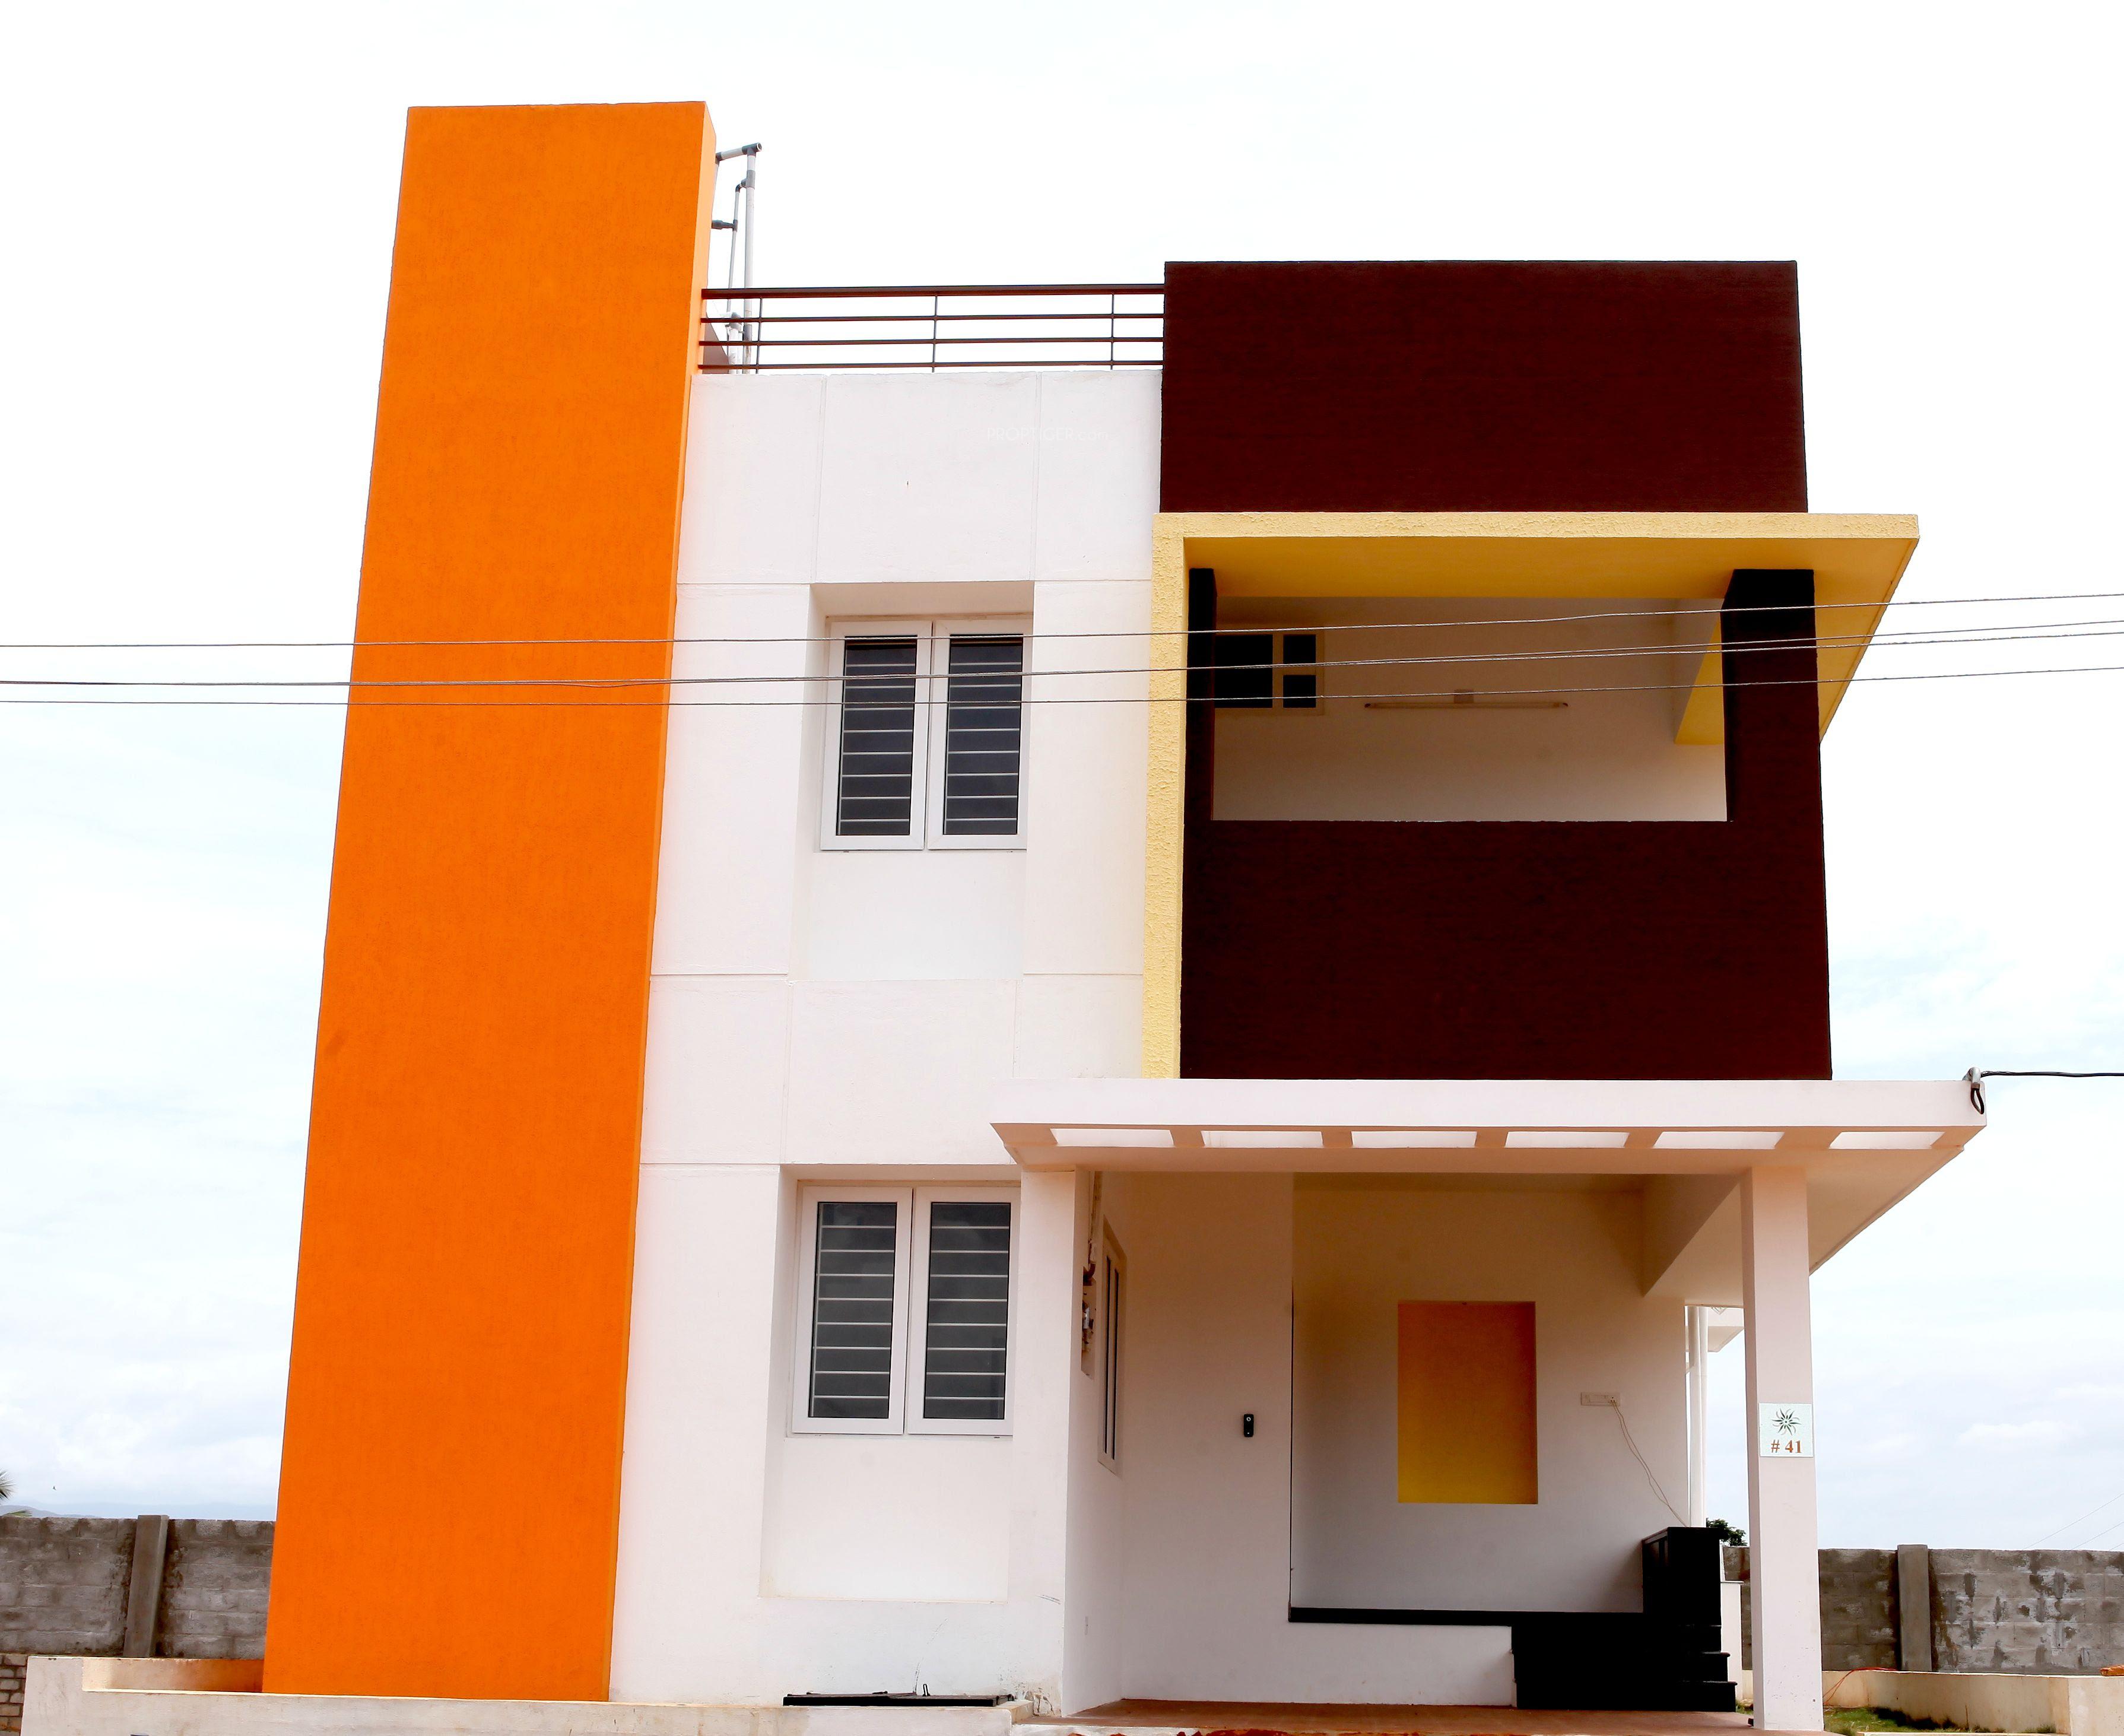 Gardens & Villa - Orange Blossom (Honey I'm Home Session ...